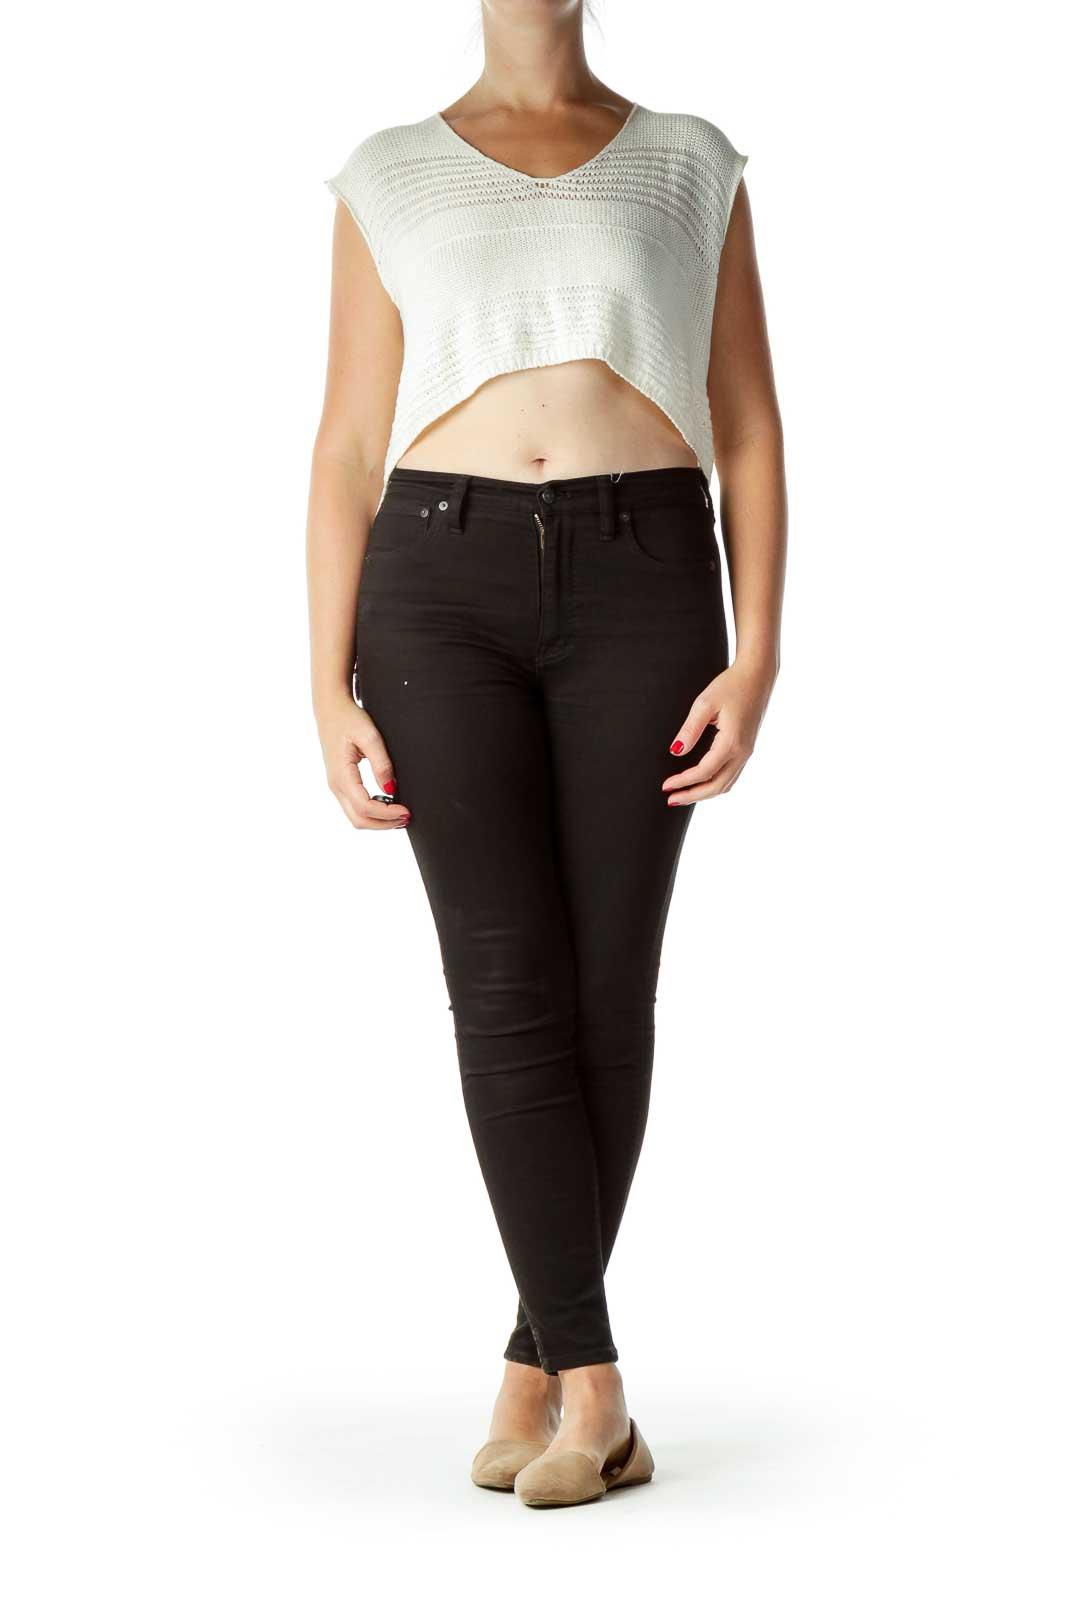 Cream One Size Asymmetric Vest